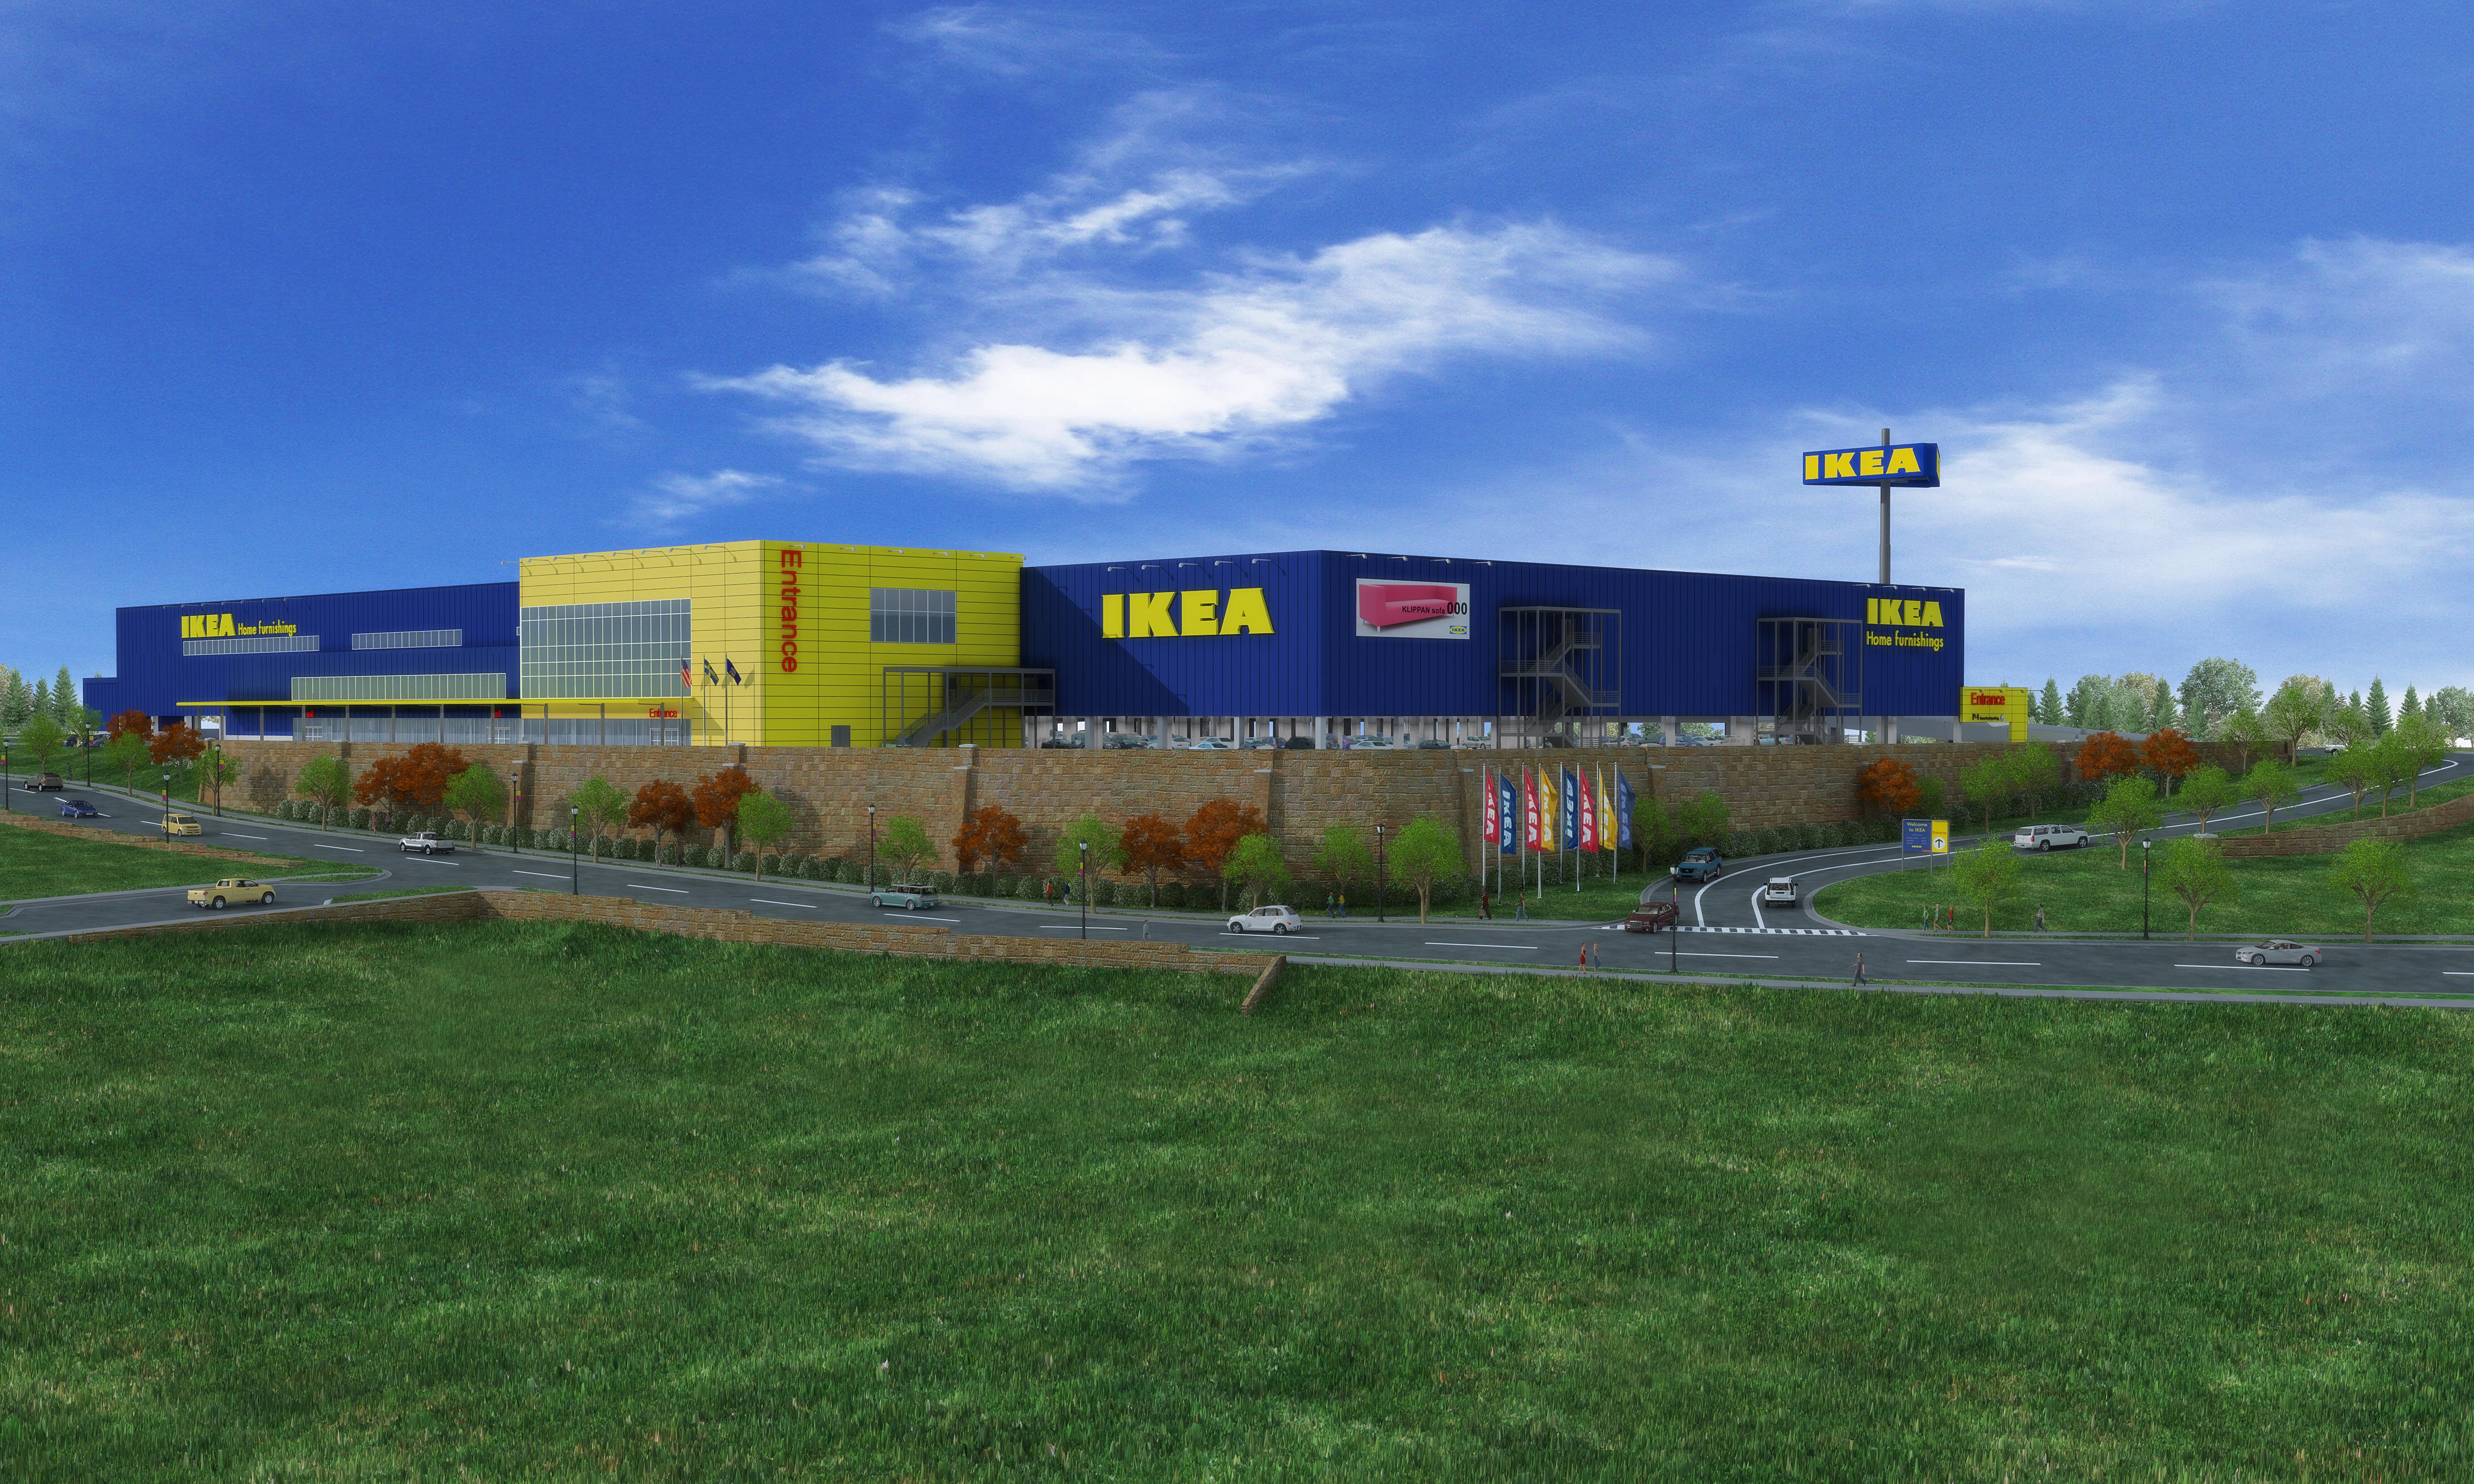 Swedish Home Furnishings Retailer Ikea Begins On Site Demolition